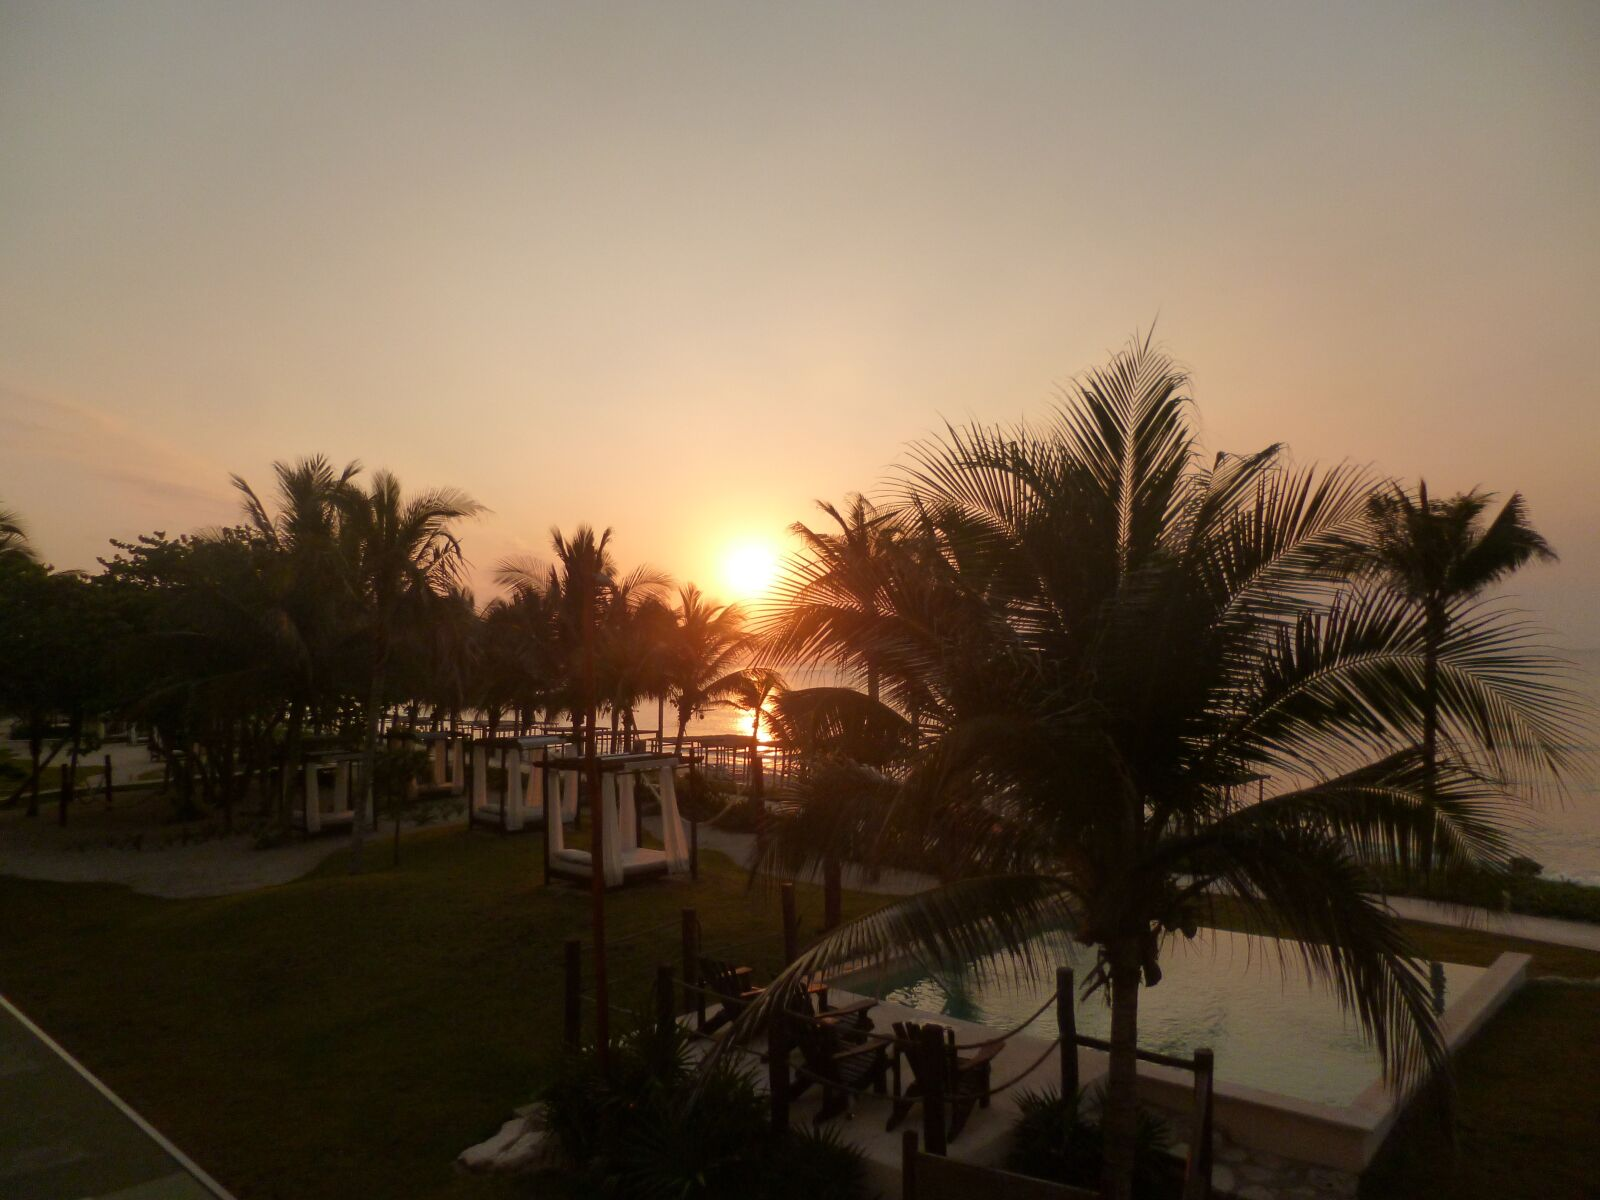 sunset, tropics, palms